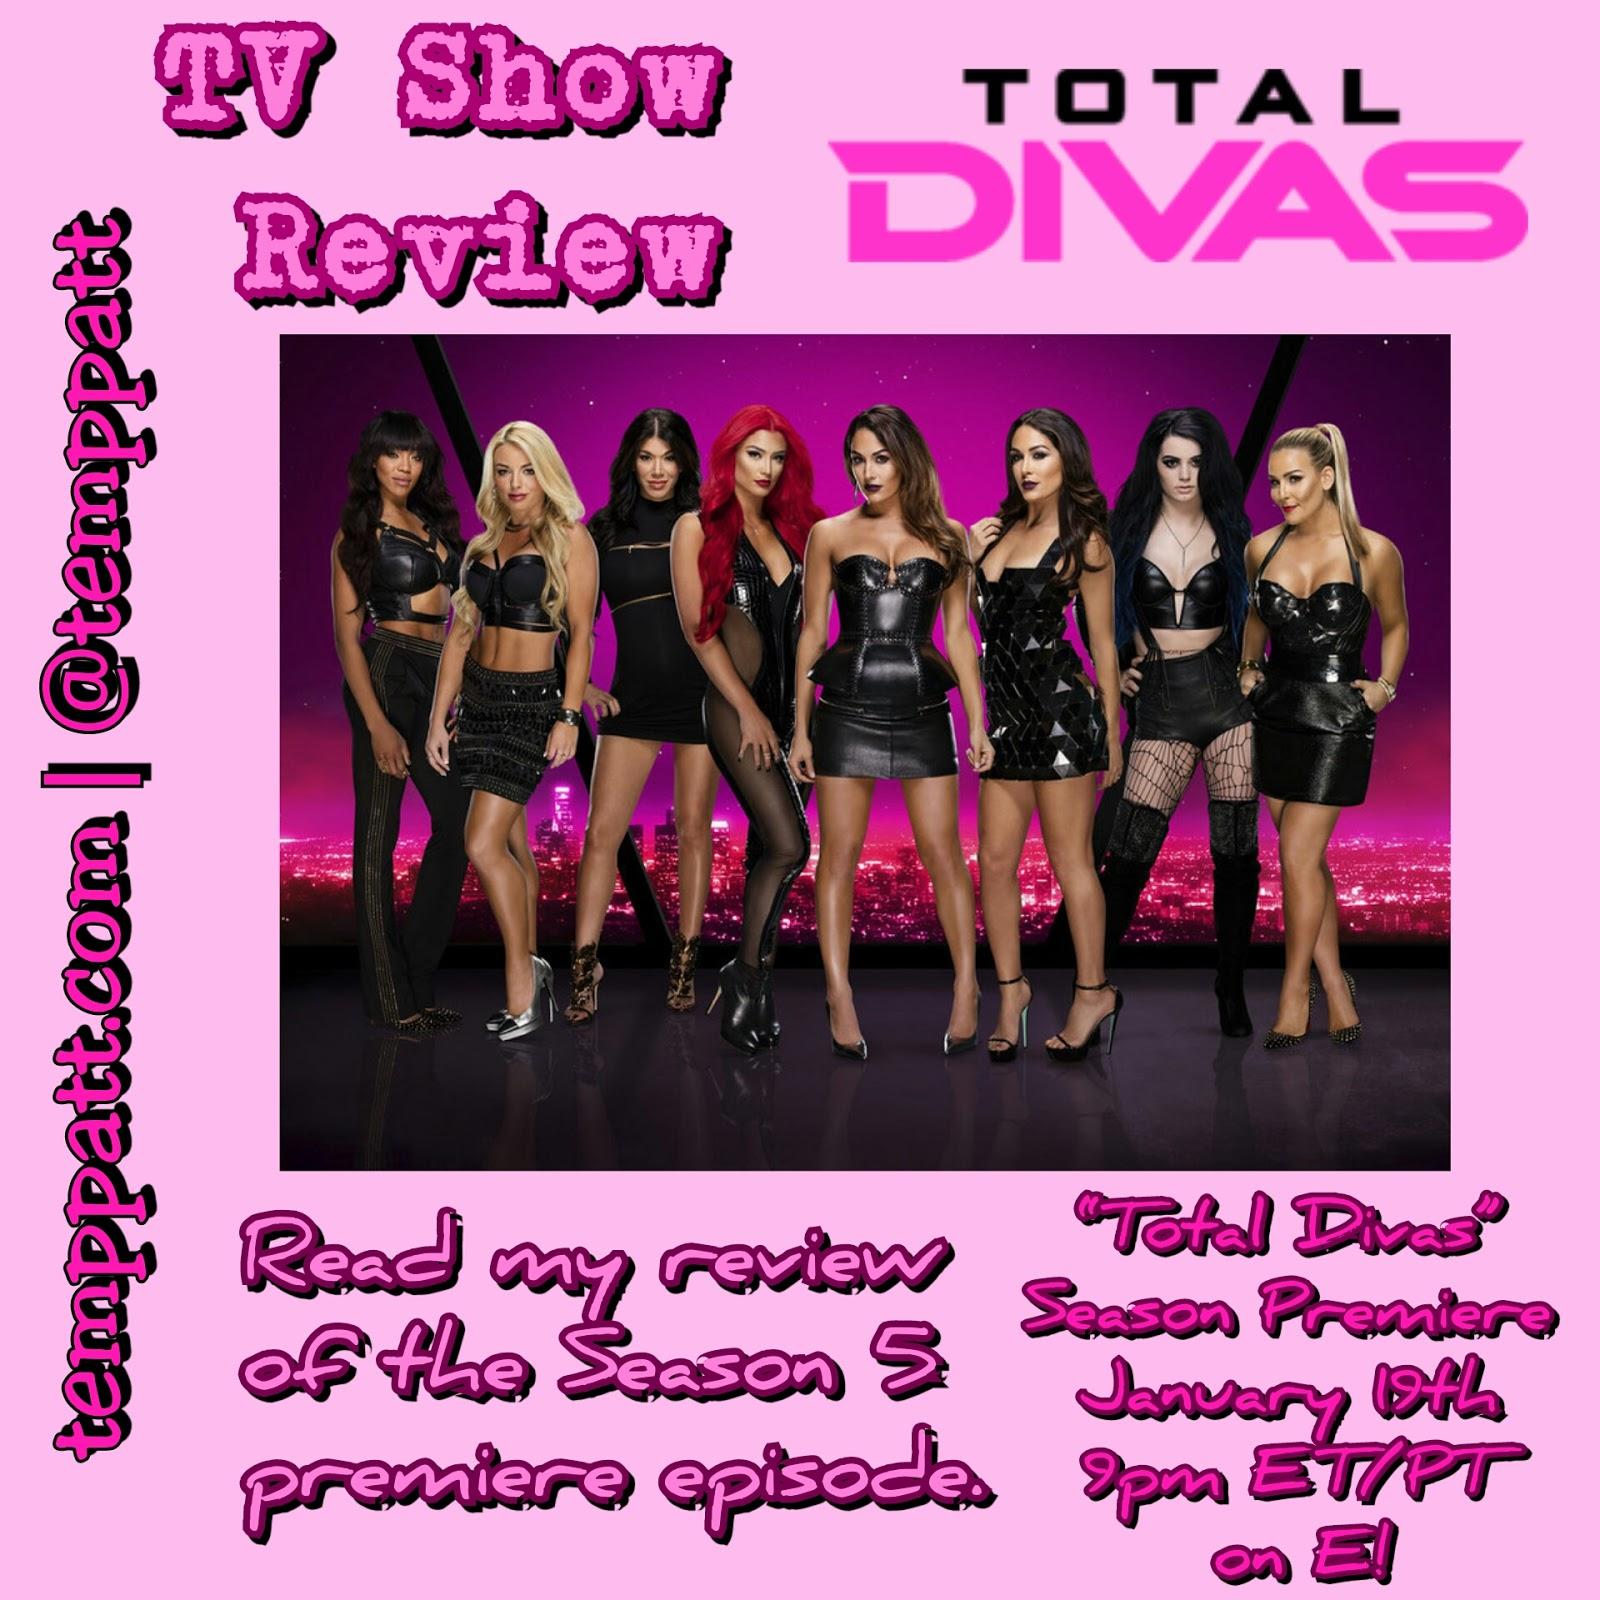 Tv show review total divas temppatt for Diva tv